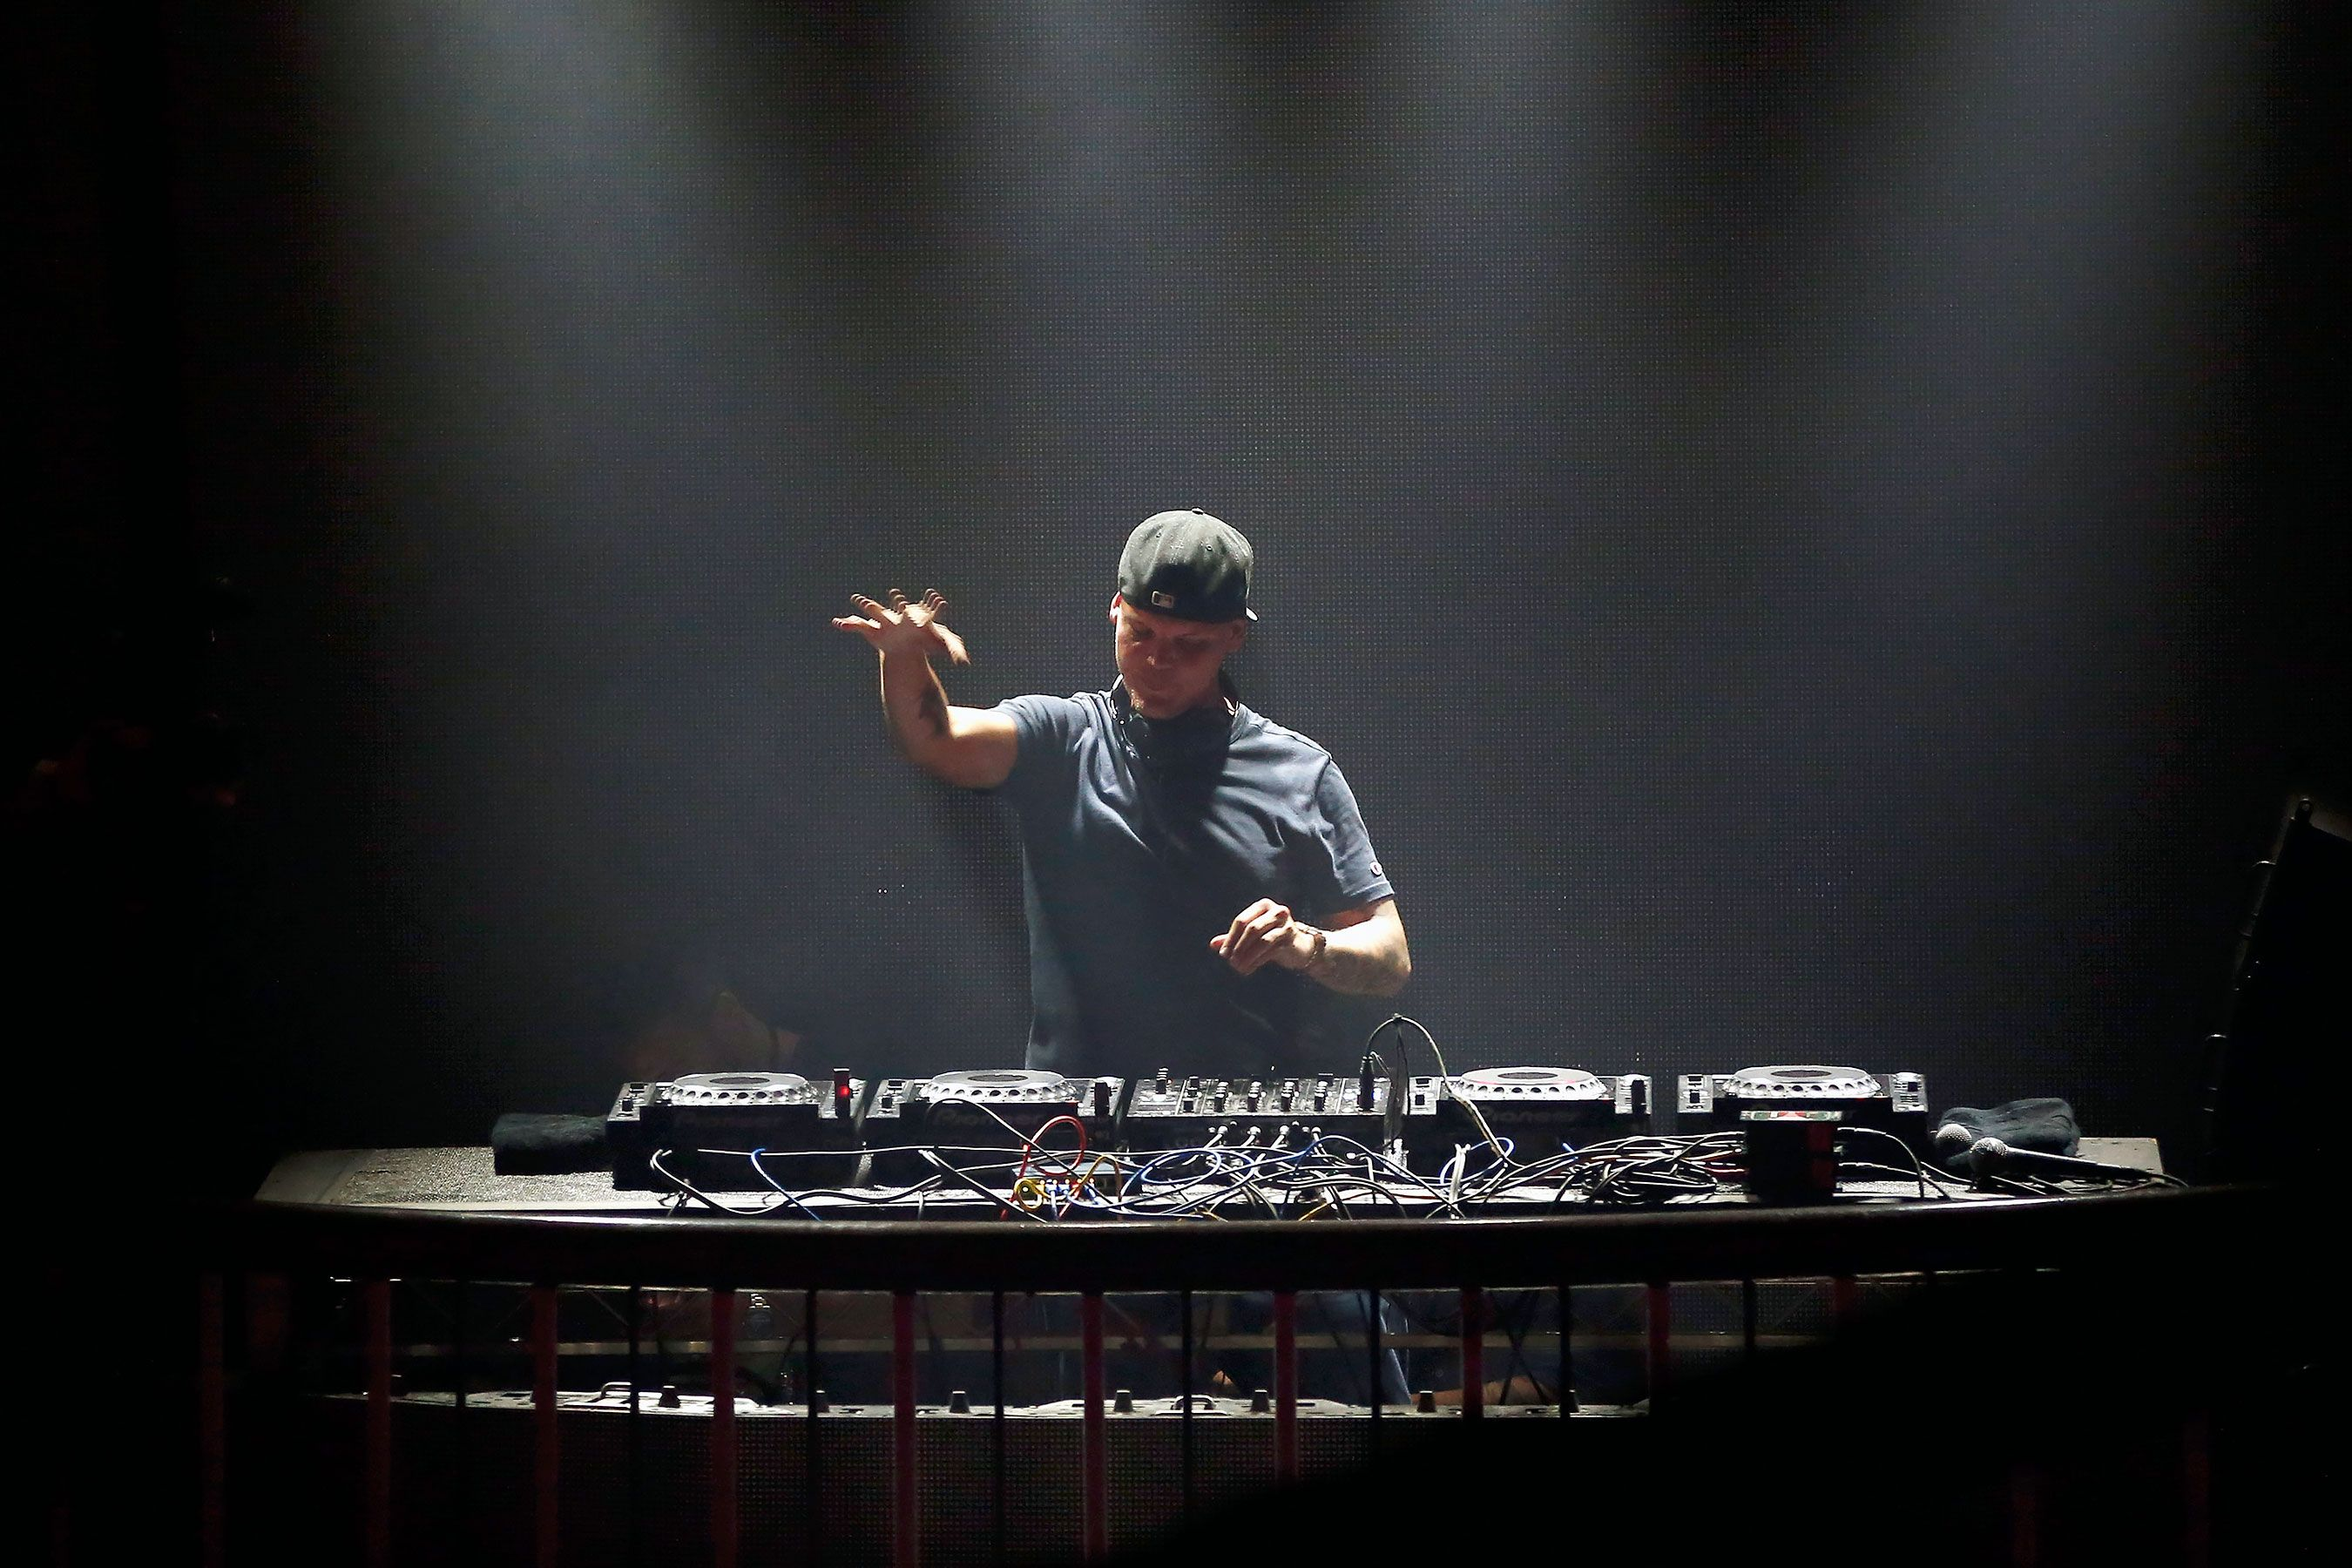 Avicii Swedish Deejay And Wake Me Up Hitmaker Dead At 28